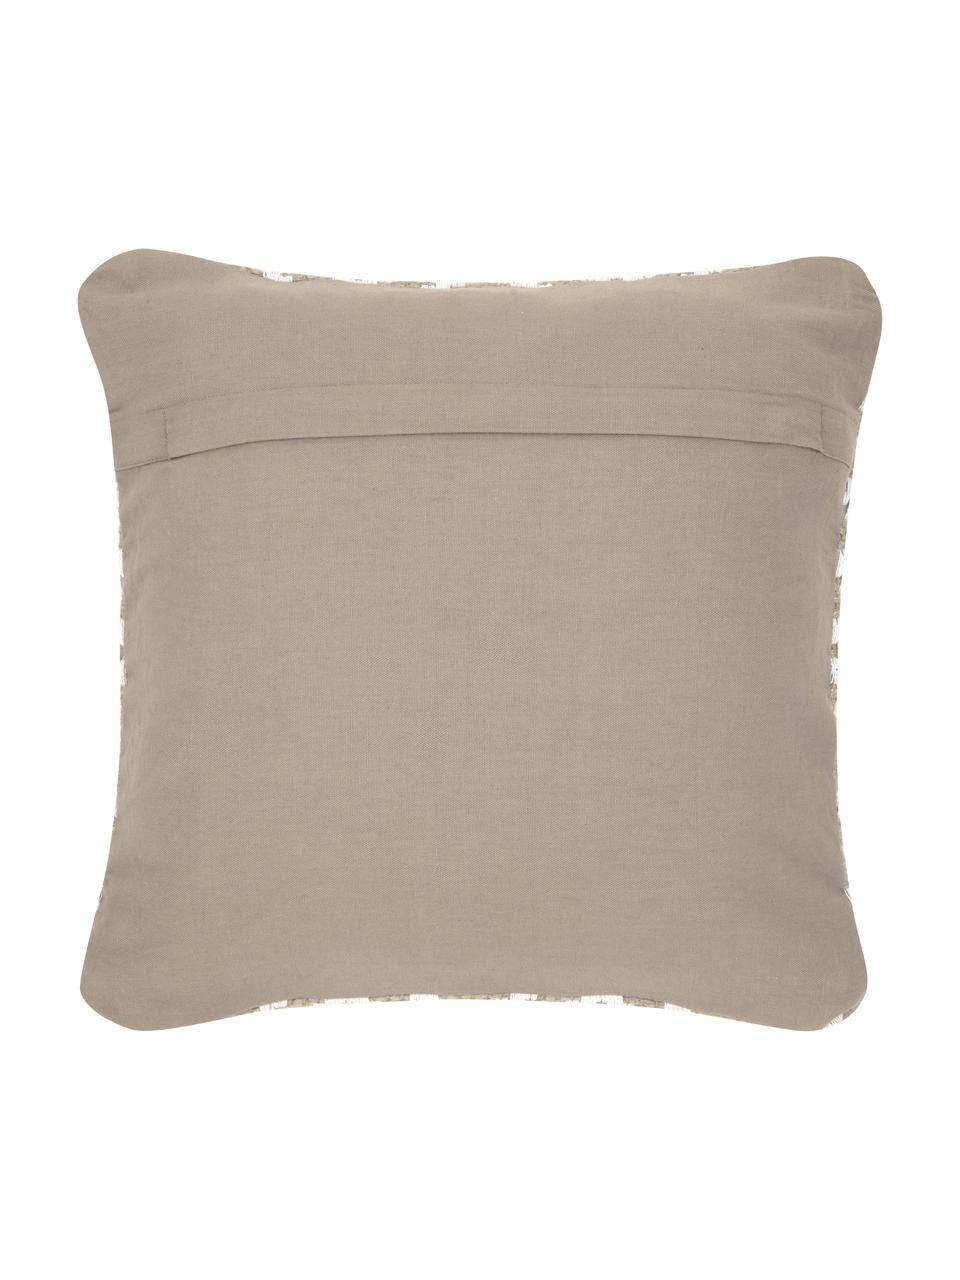 Kissenhülle Diajute aus Jute/Baumwoll-Mix, Vorderseite: 55% Jute, 45% Baumwolle, Rückseite: Baumwolle, Vorderseite: Beige, CremeweißRückseite: Hellbeige, 45 x 45 cm